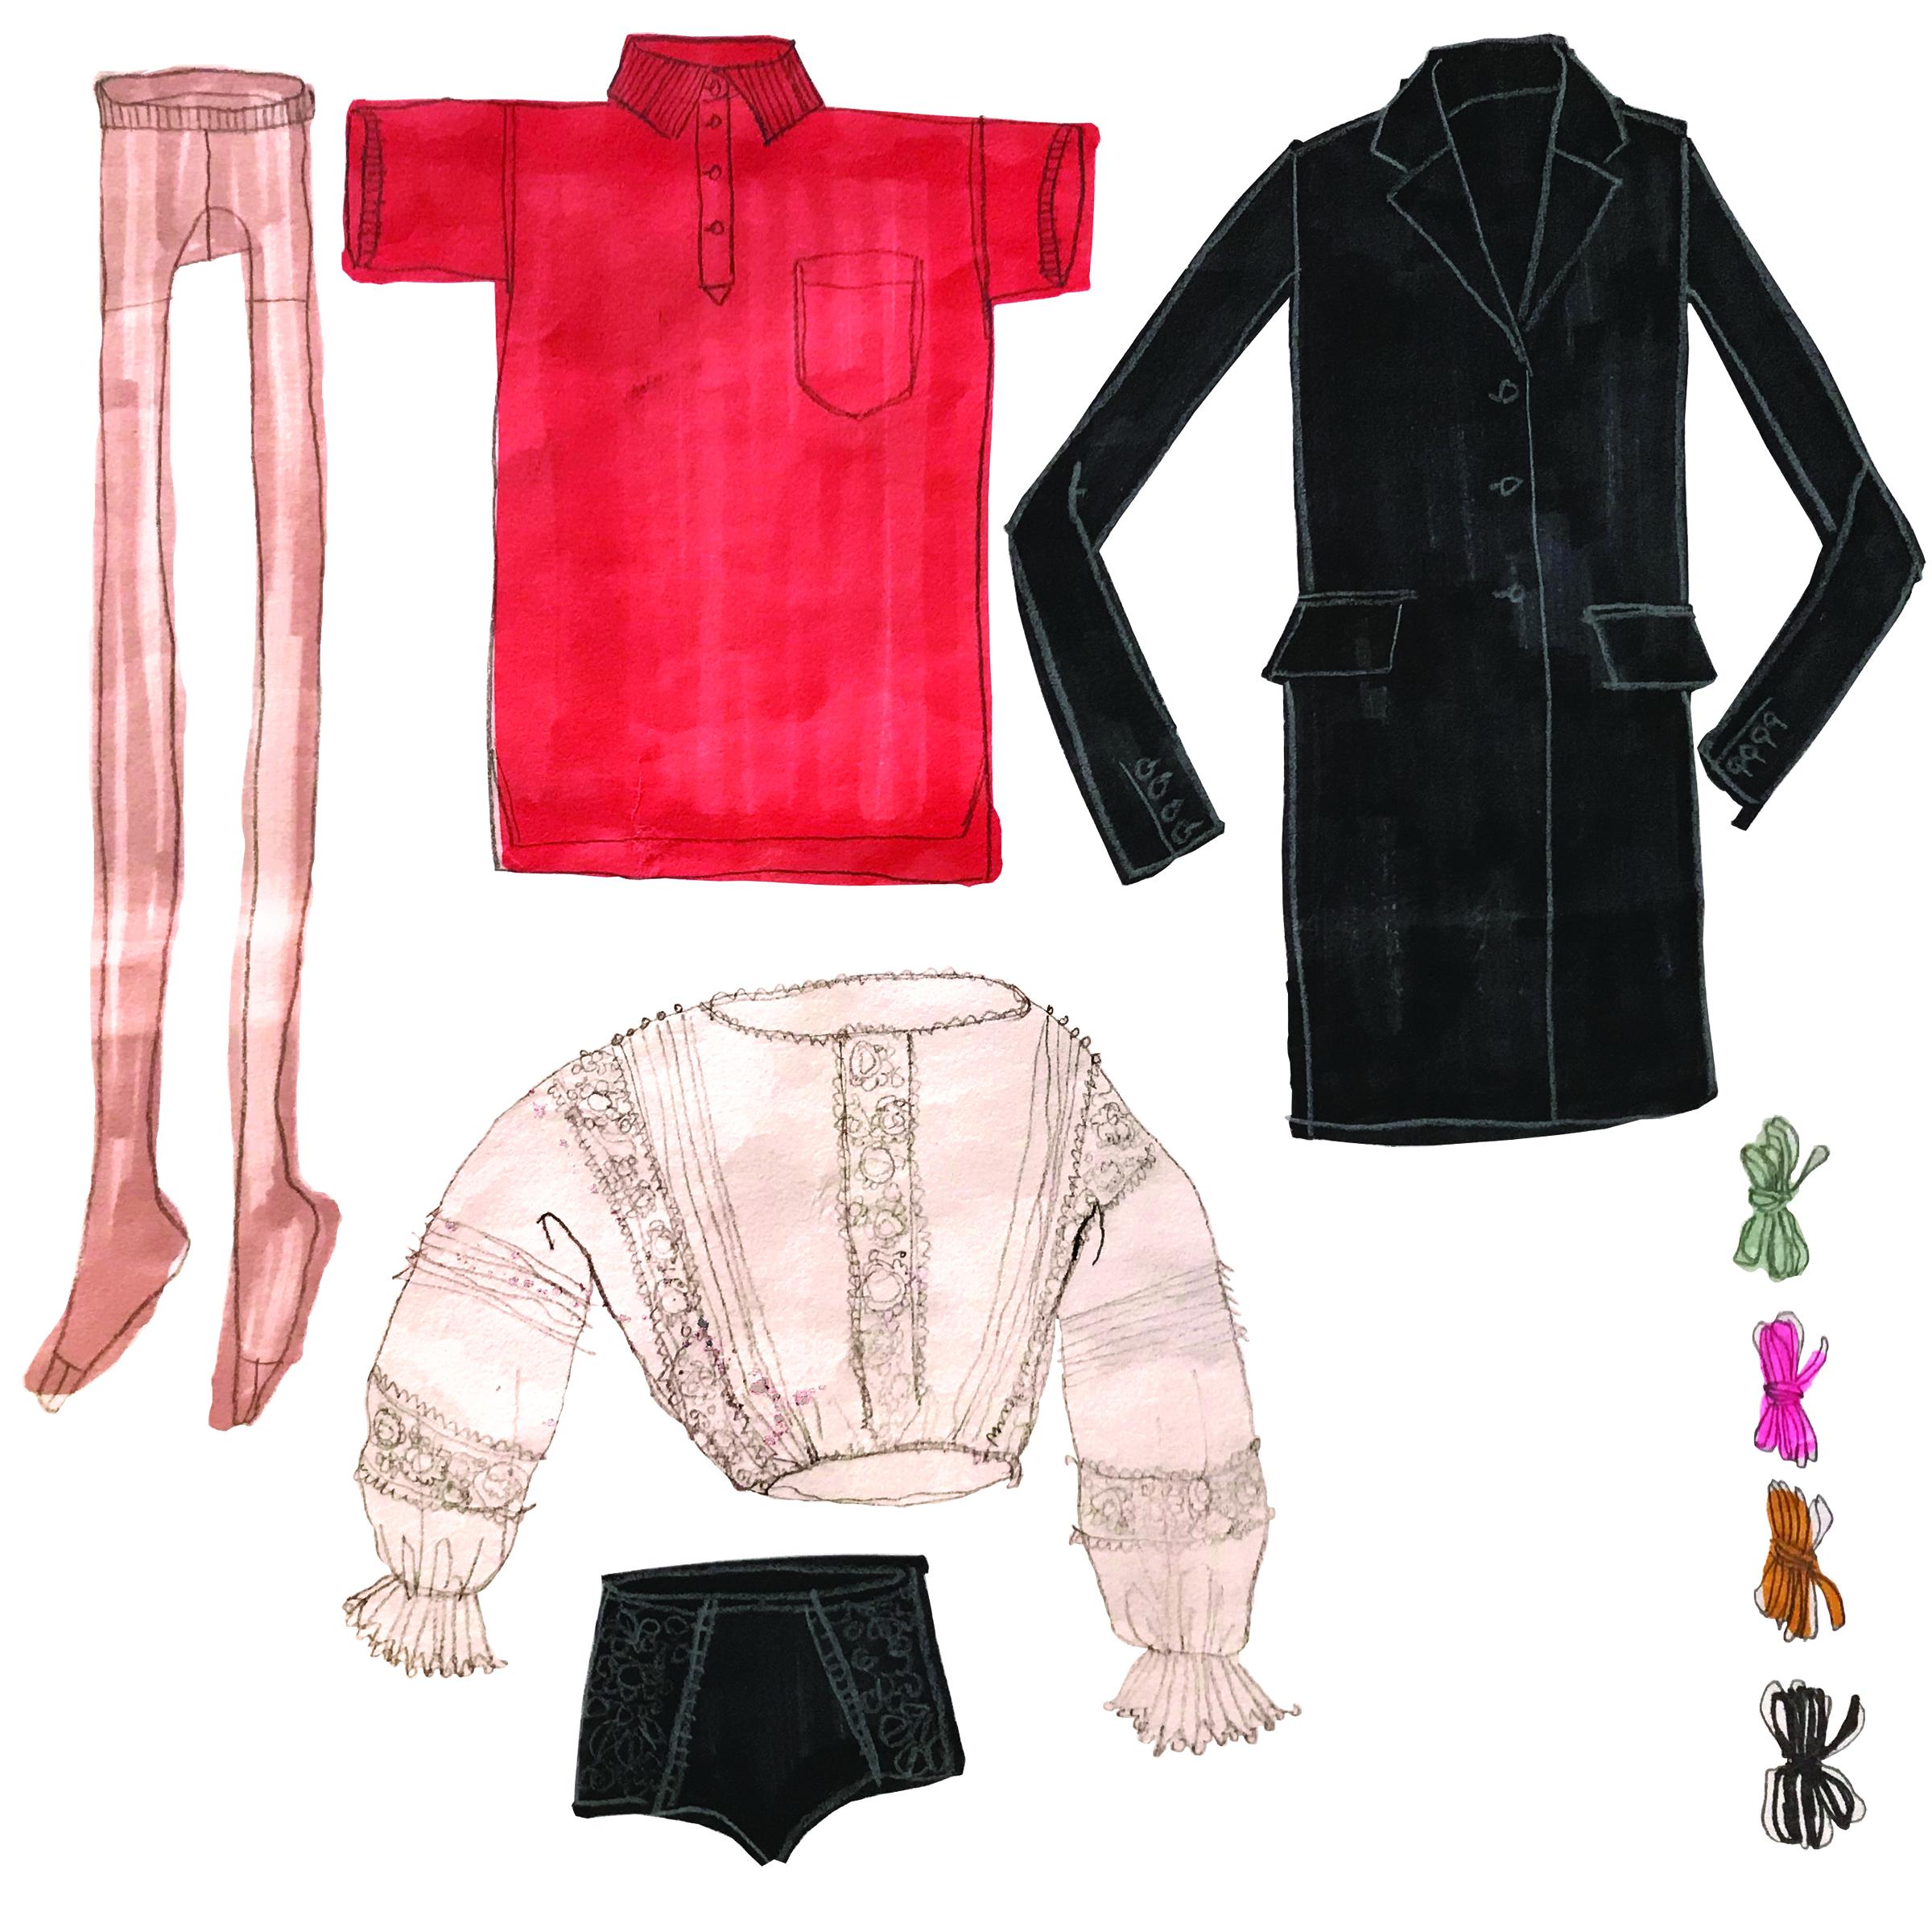 Tiny Clothes3.jpg